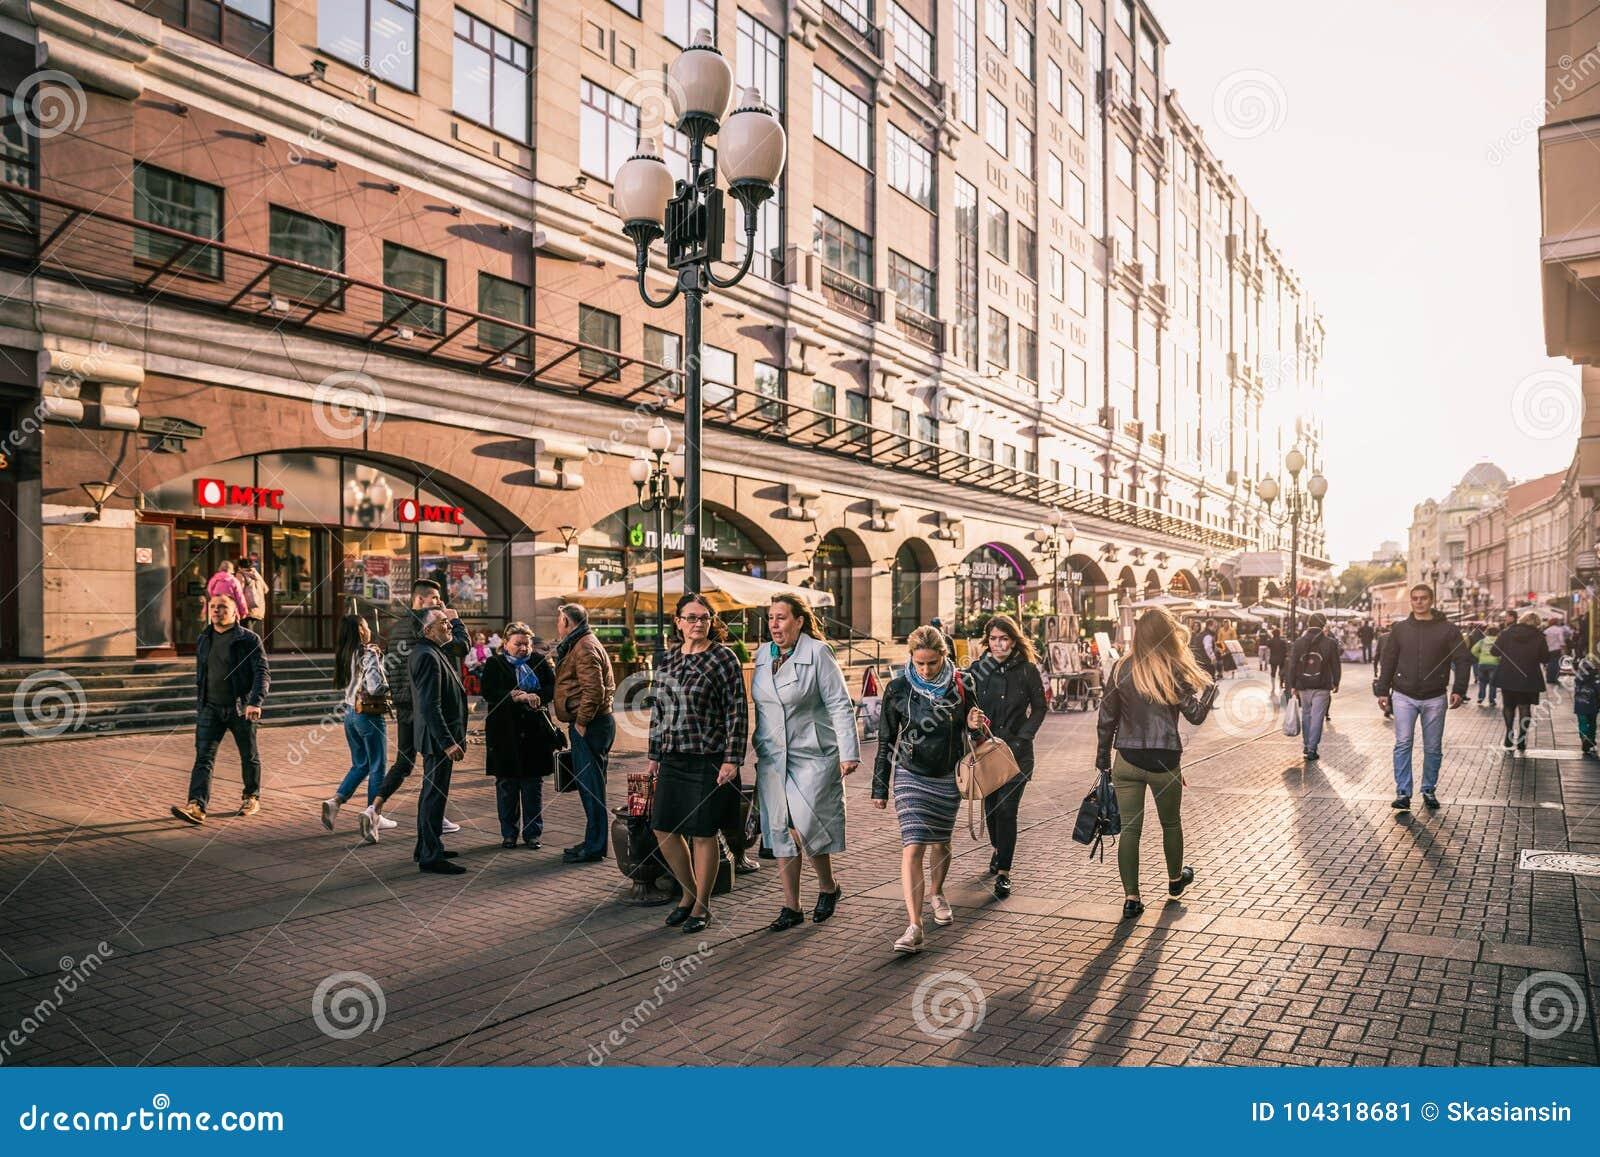 Walking around Moscow 40